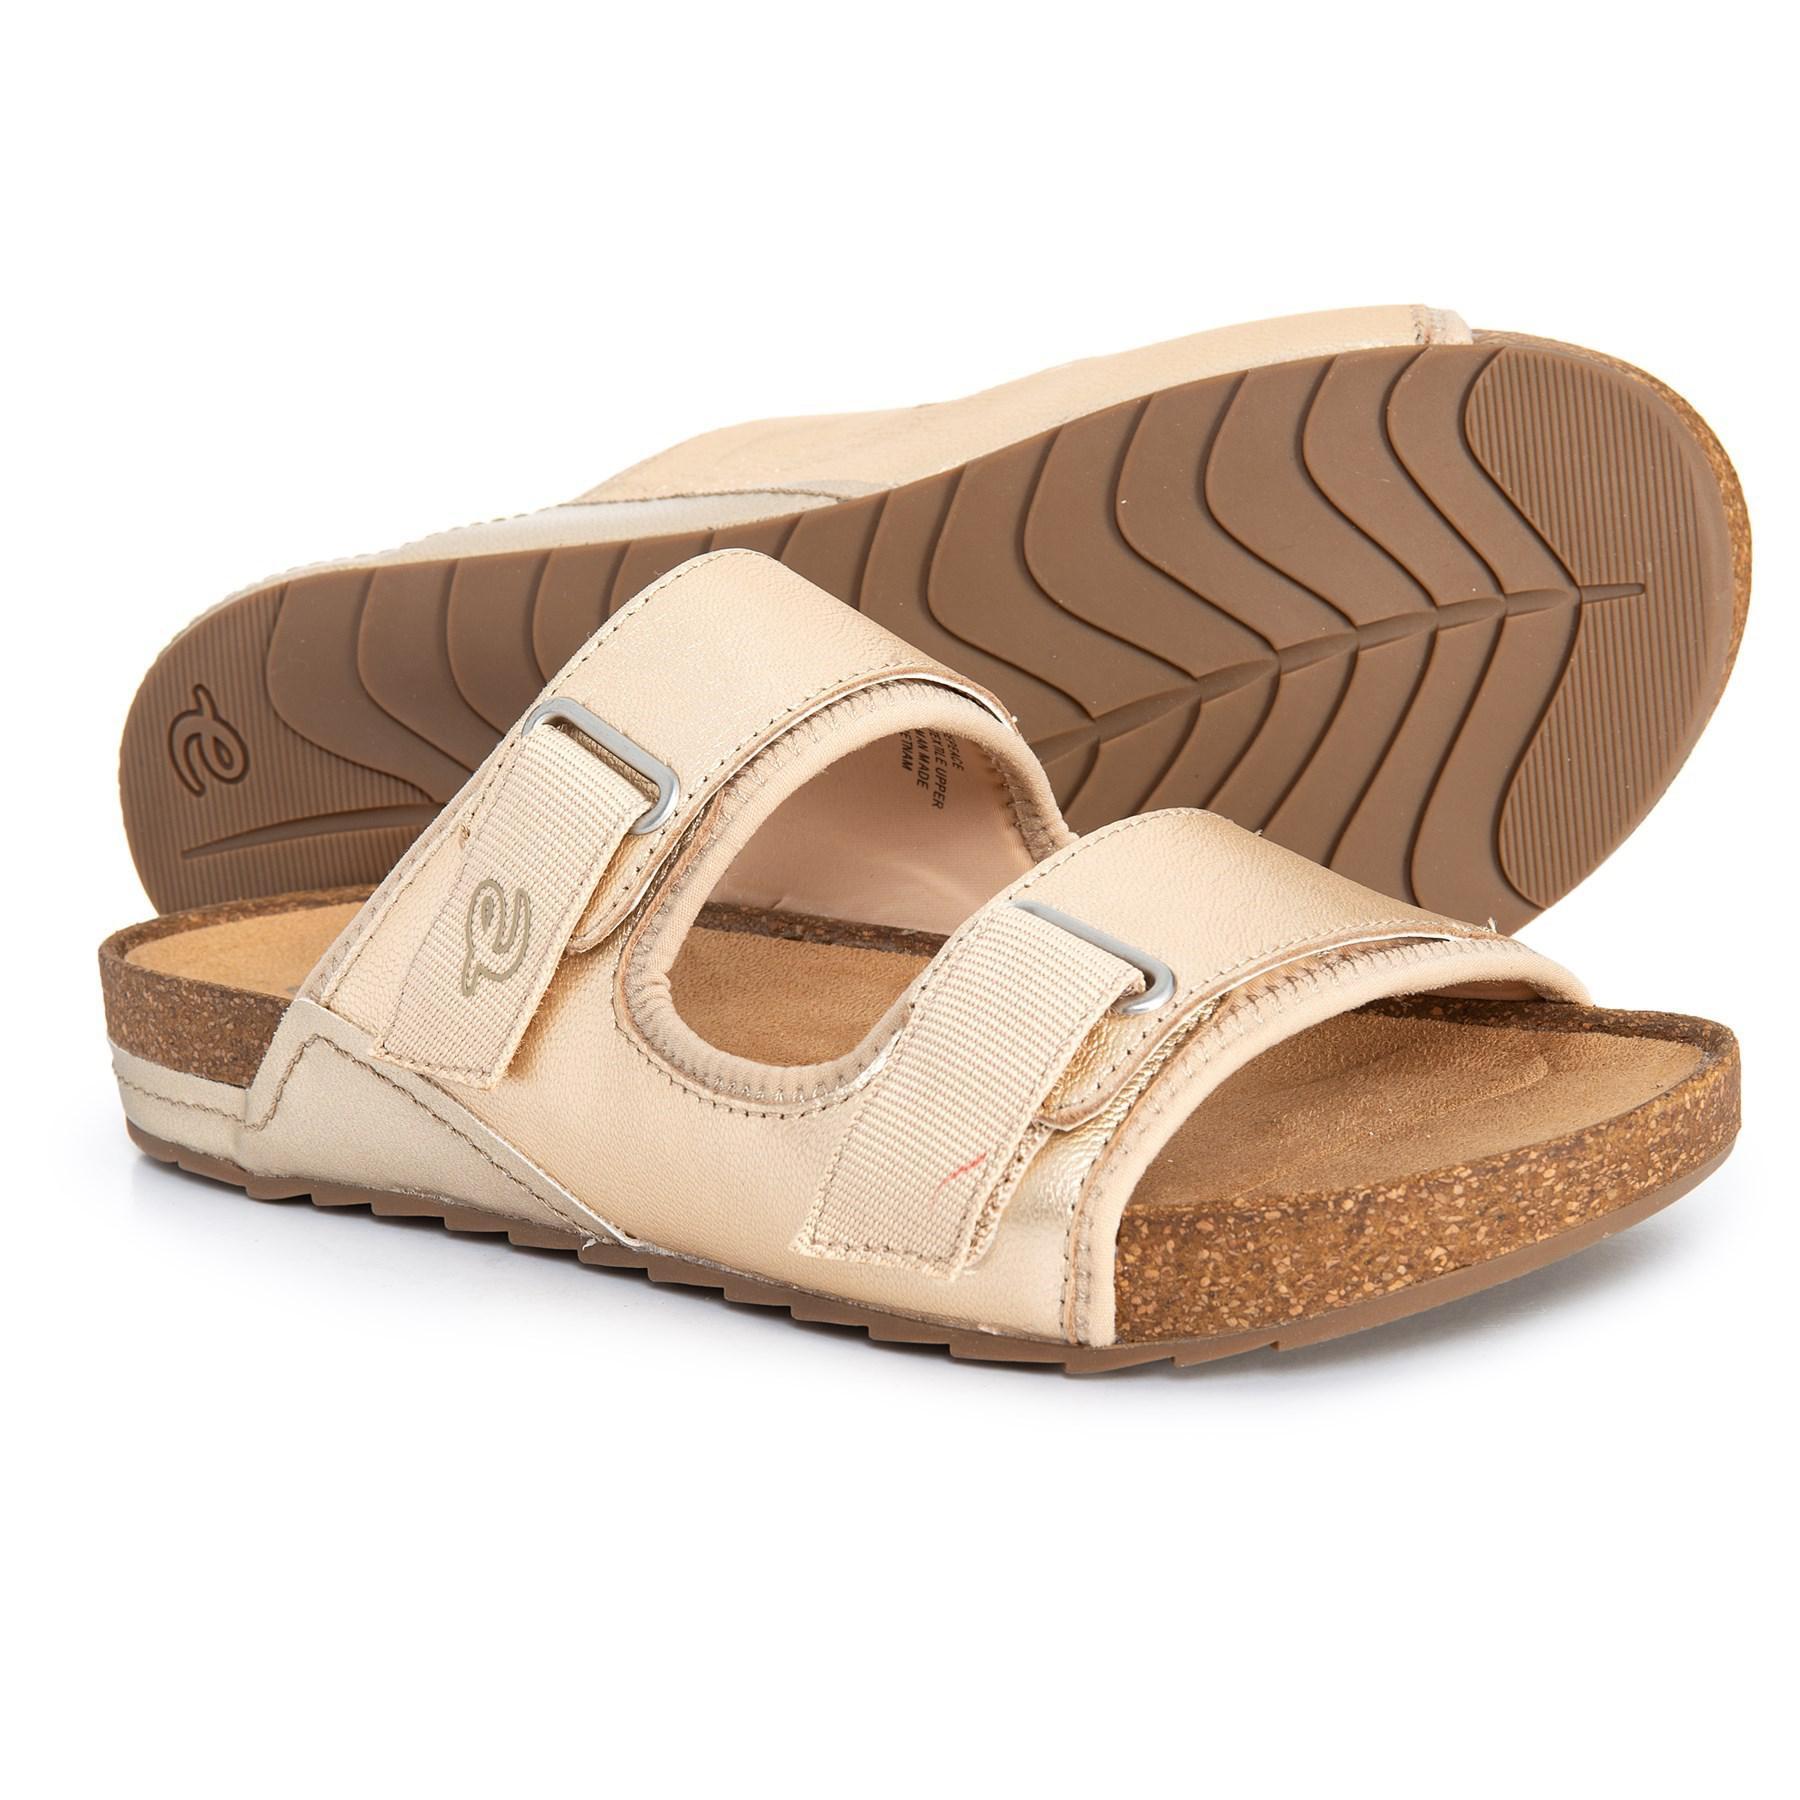 f7157b55d00f8e Easy spirit platino peace slide sandals jpg 1800x1800 Easy spirit sandals  slide